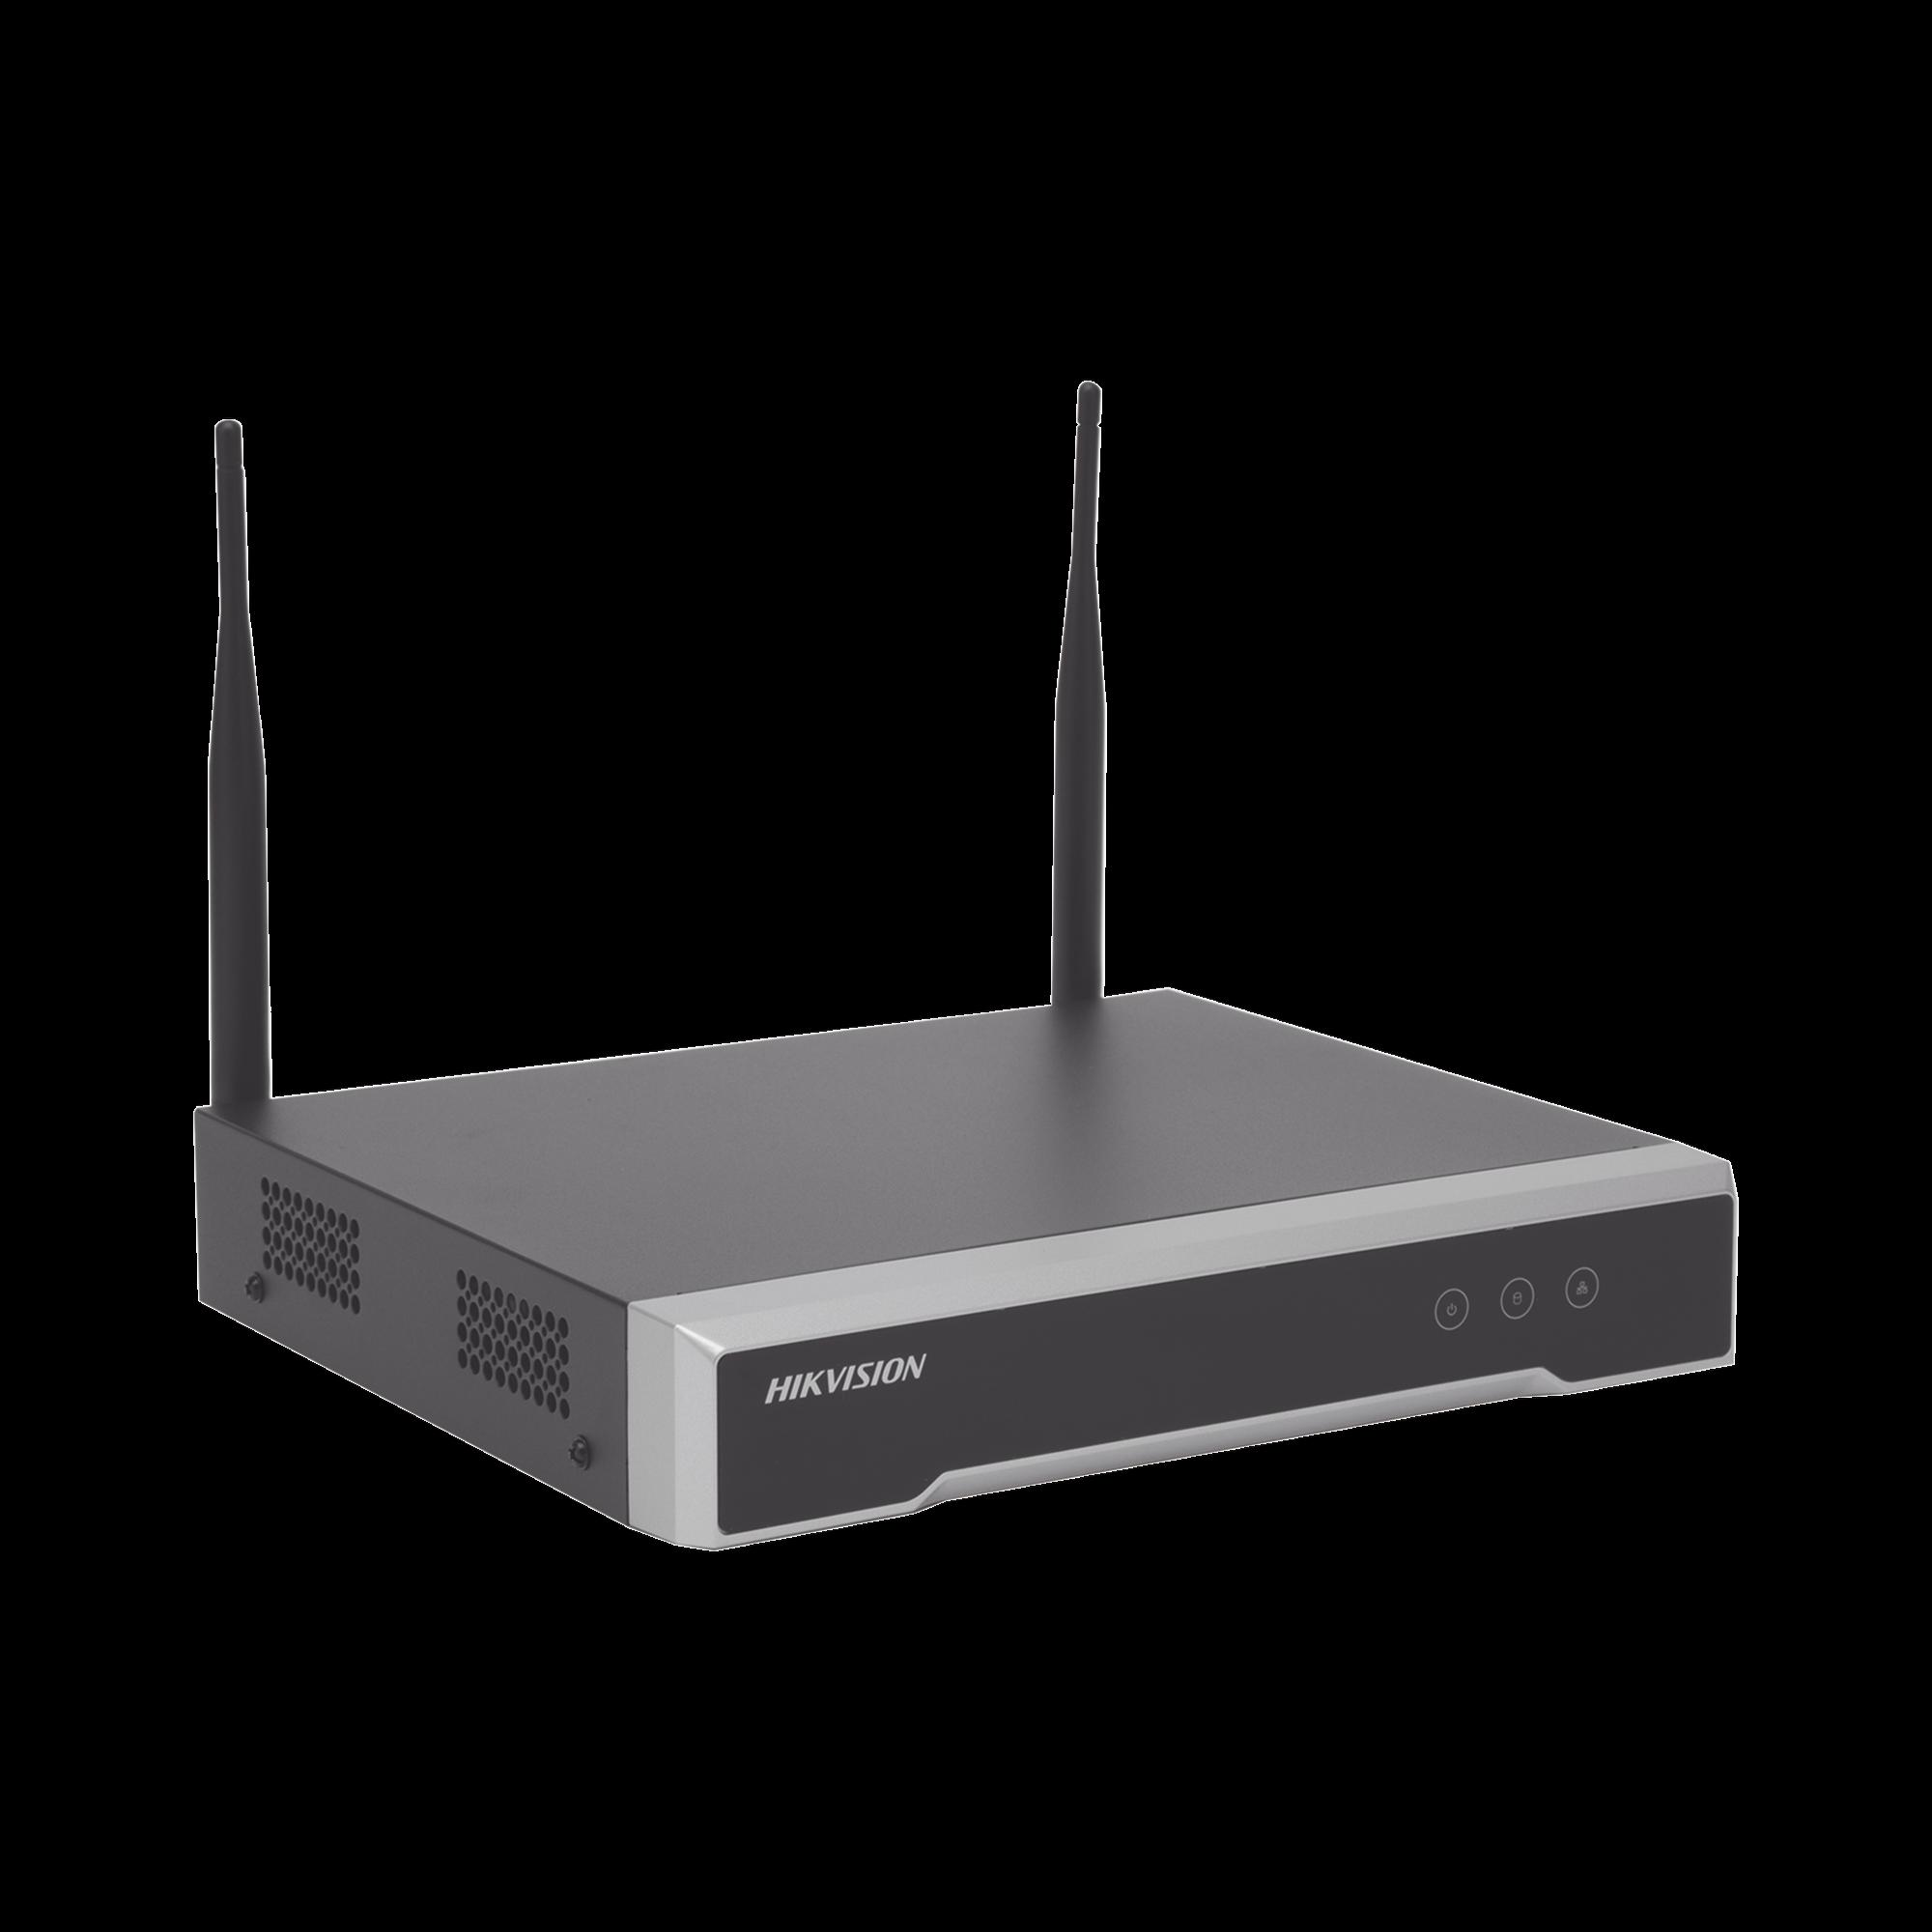 NVR 4 Megapixel / 8 canales IP / 1 Bahía de Disco Duro / 2 Antenas Wi-Fi / Salida de Vídeo Full HD